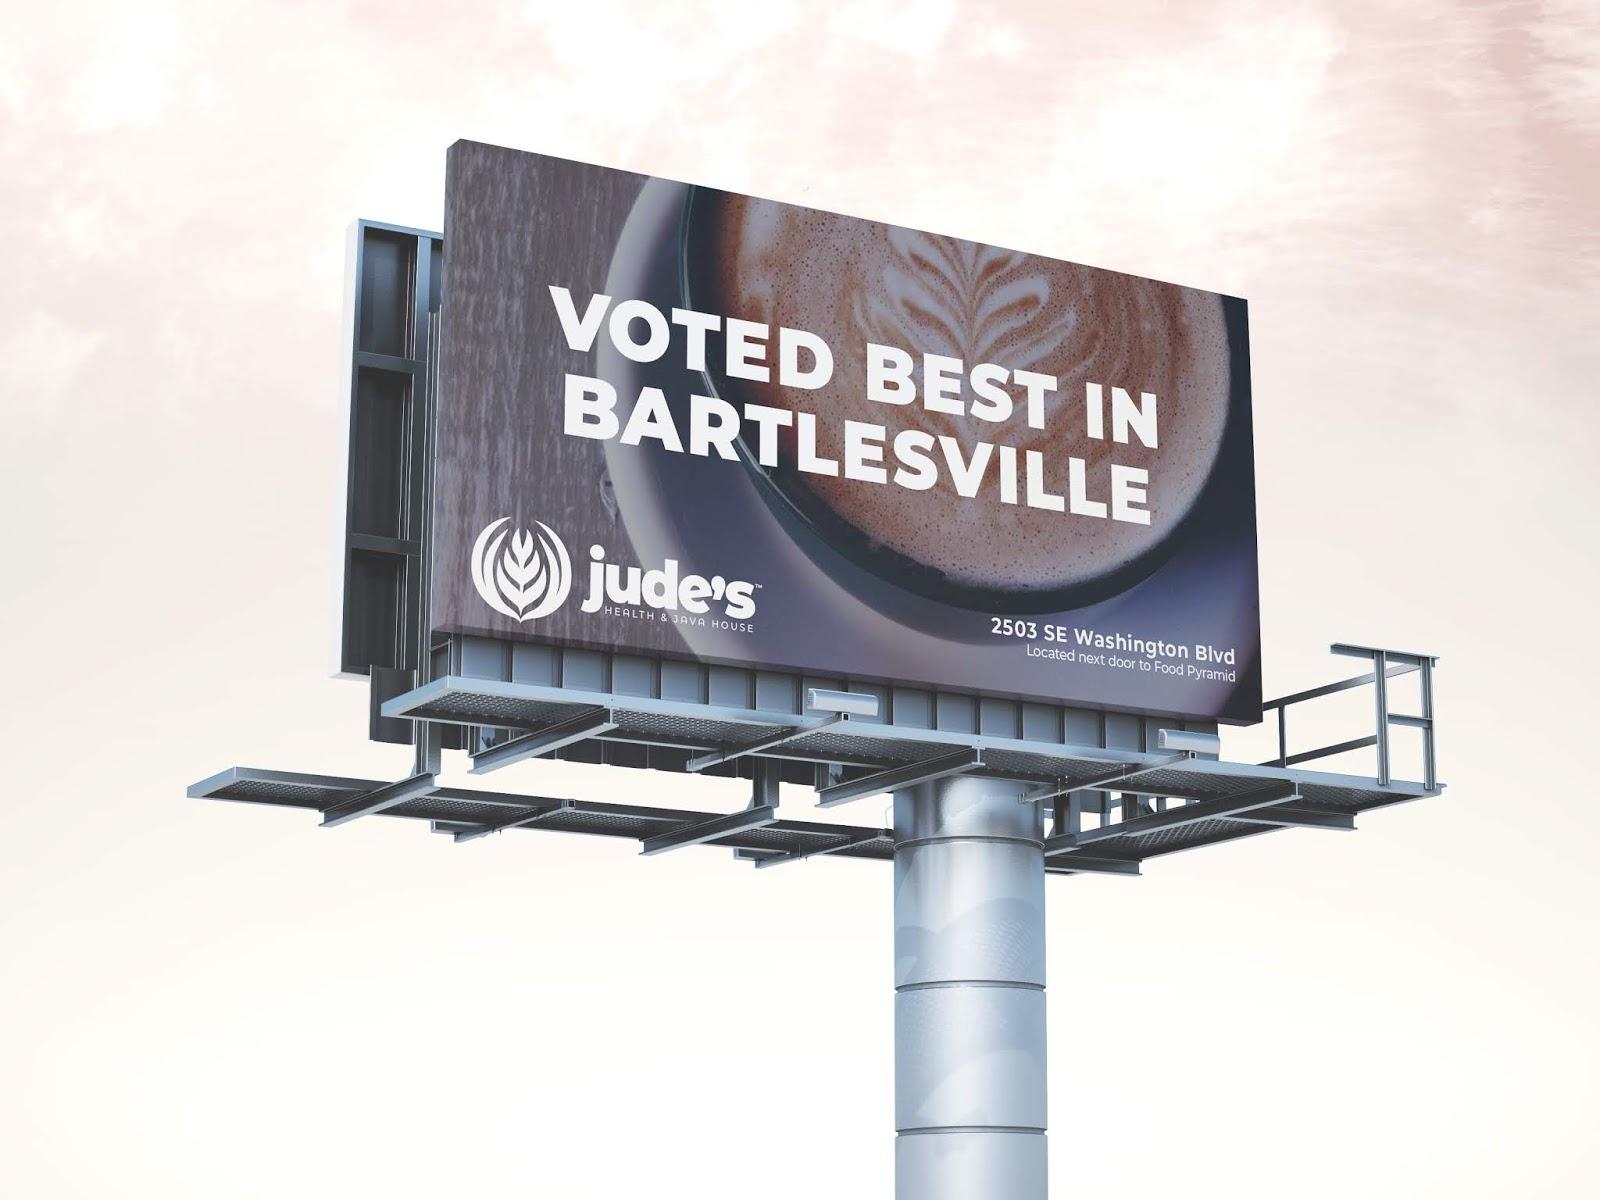 A billboard to advertist Jude's coffee